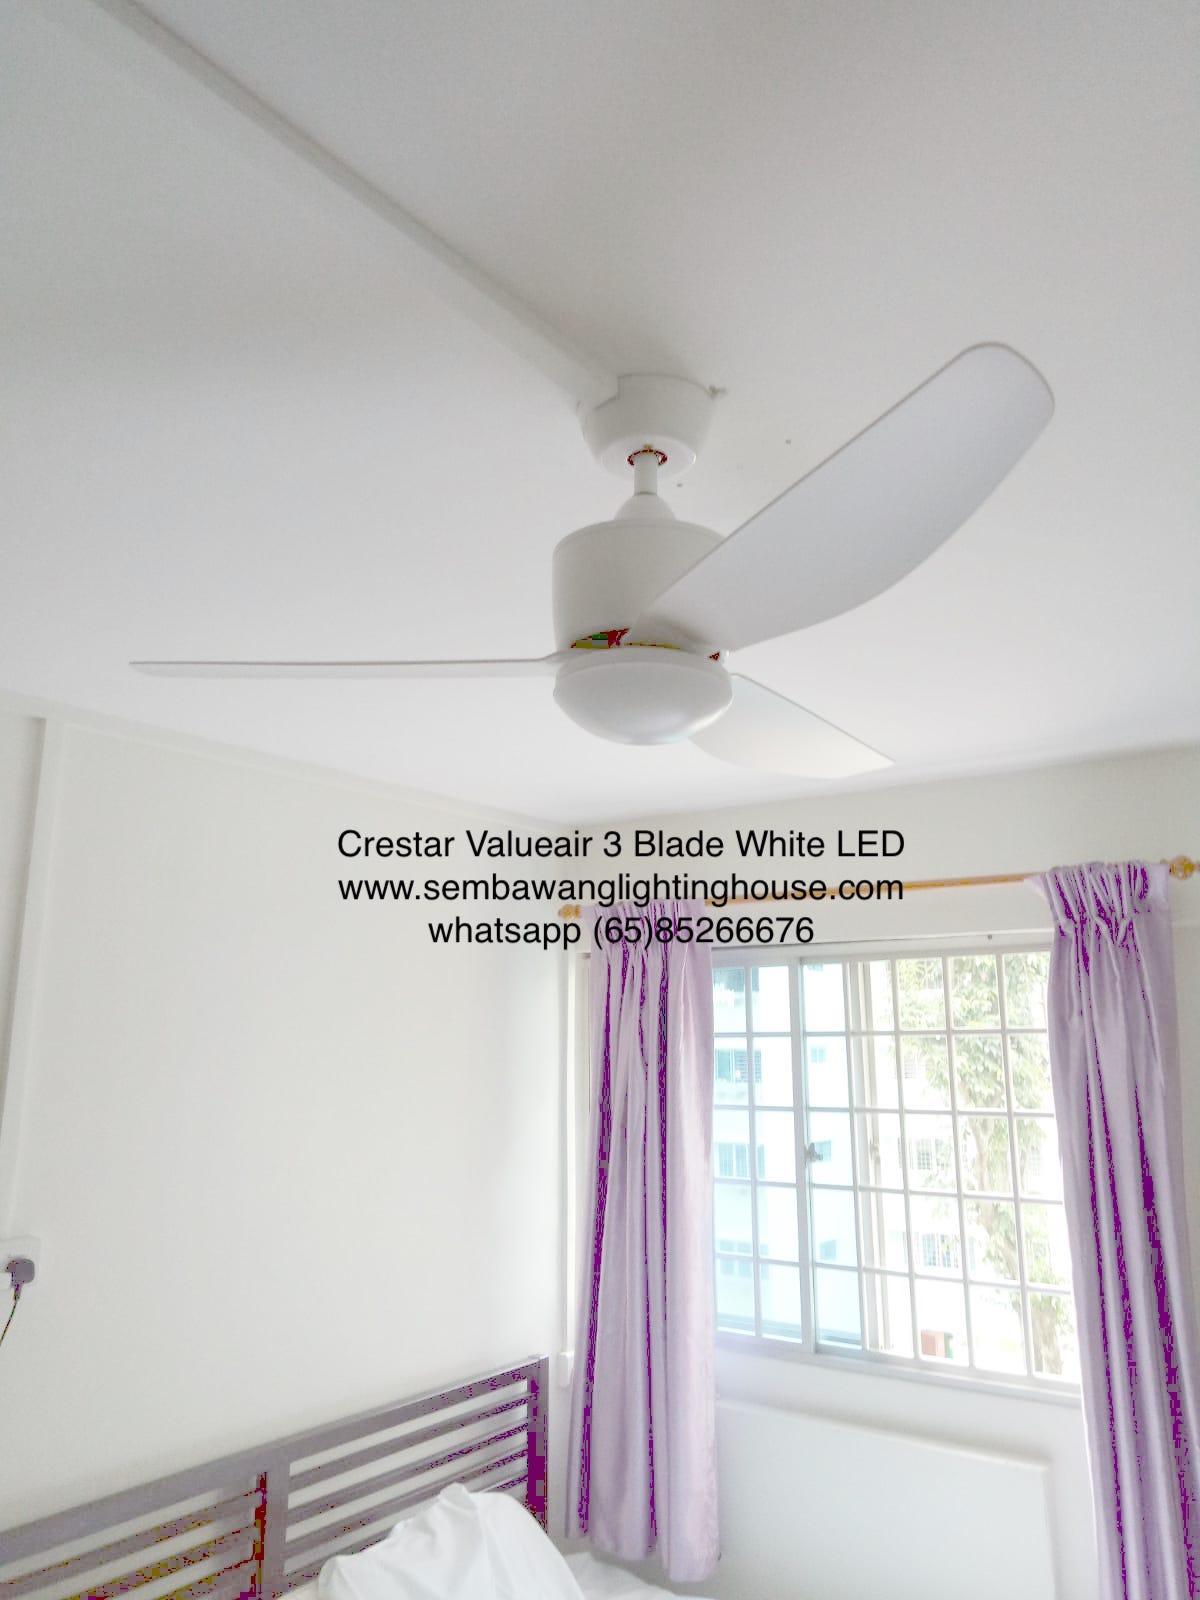 crestar-valueair-3-blade-white-ceiling-fan-sample in HDB master bedroom